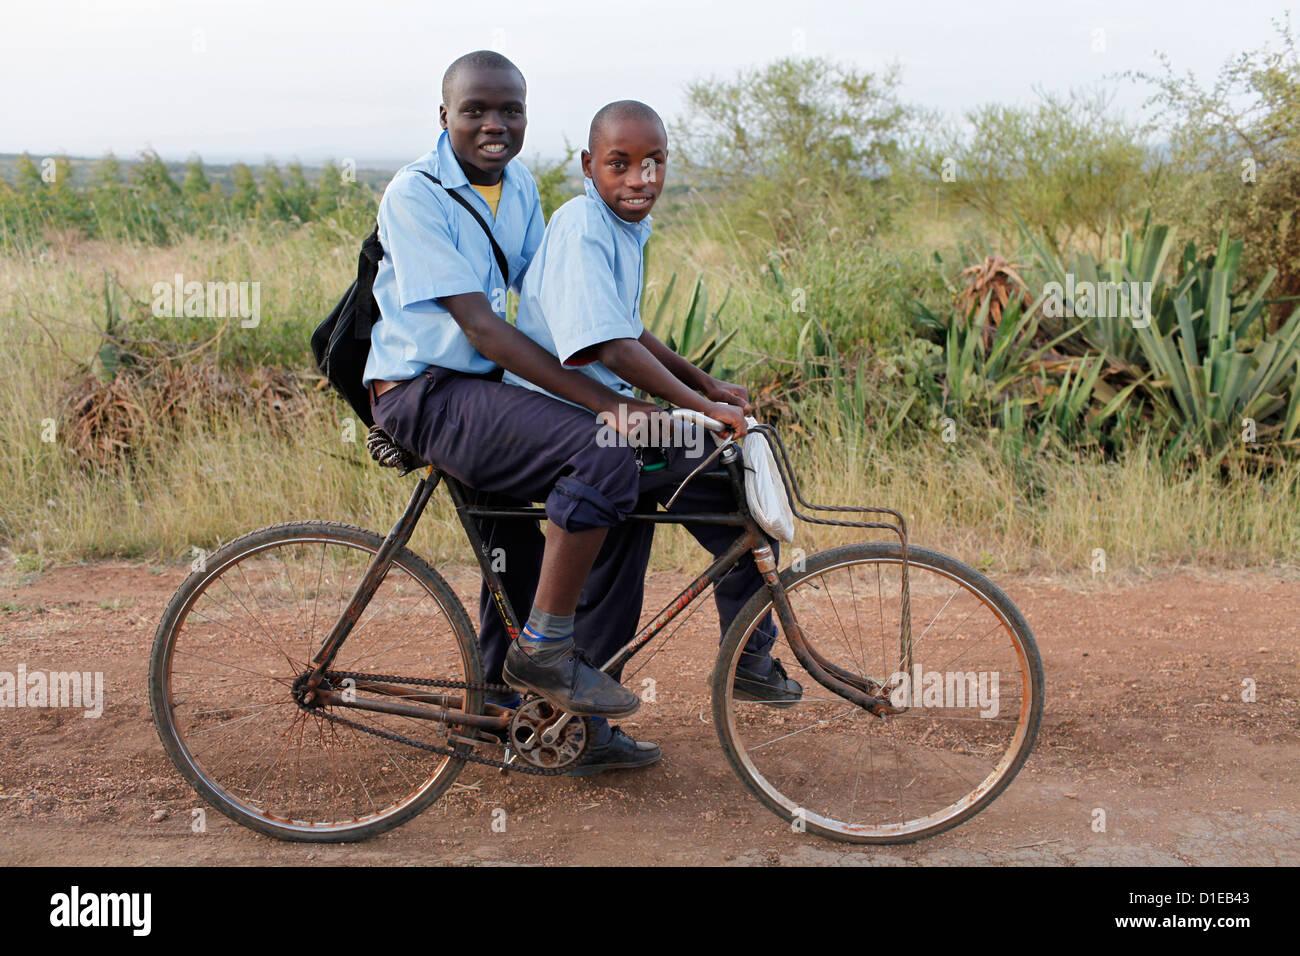 Schülerinnen und Schüler auf einem Fahrrad, Embu, Kenia, Ostafrika, Afrika Stockbild